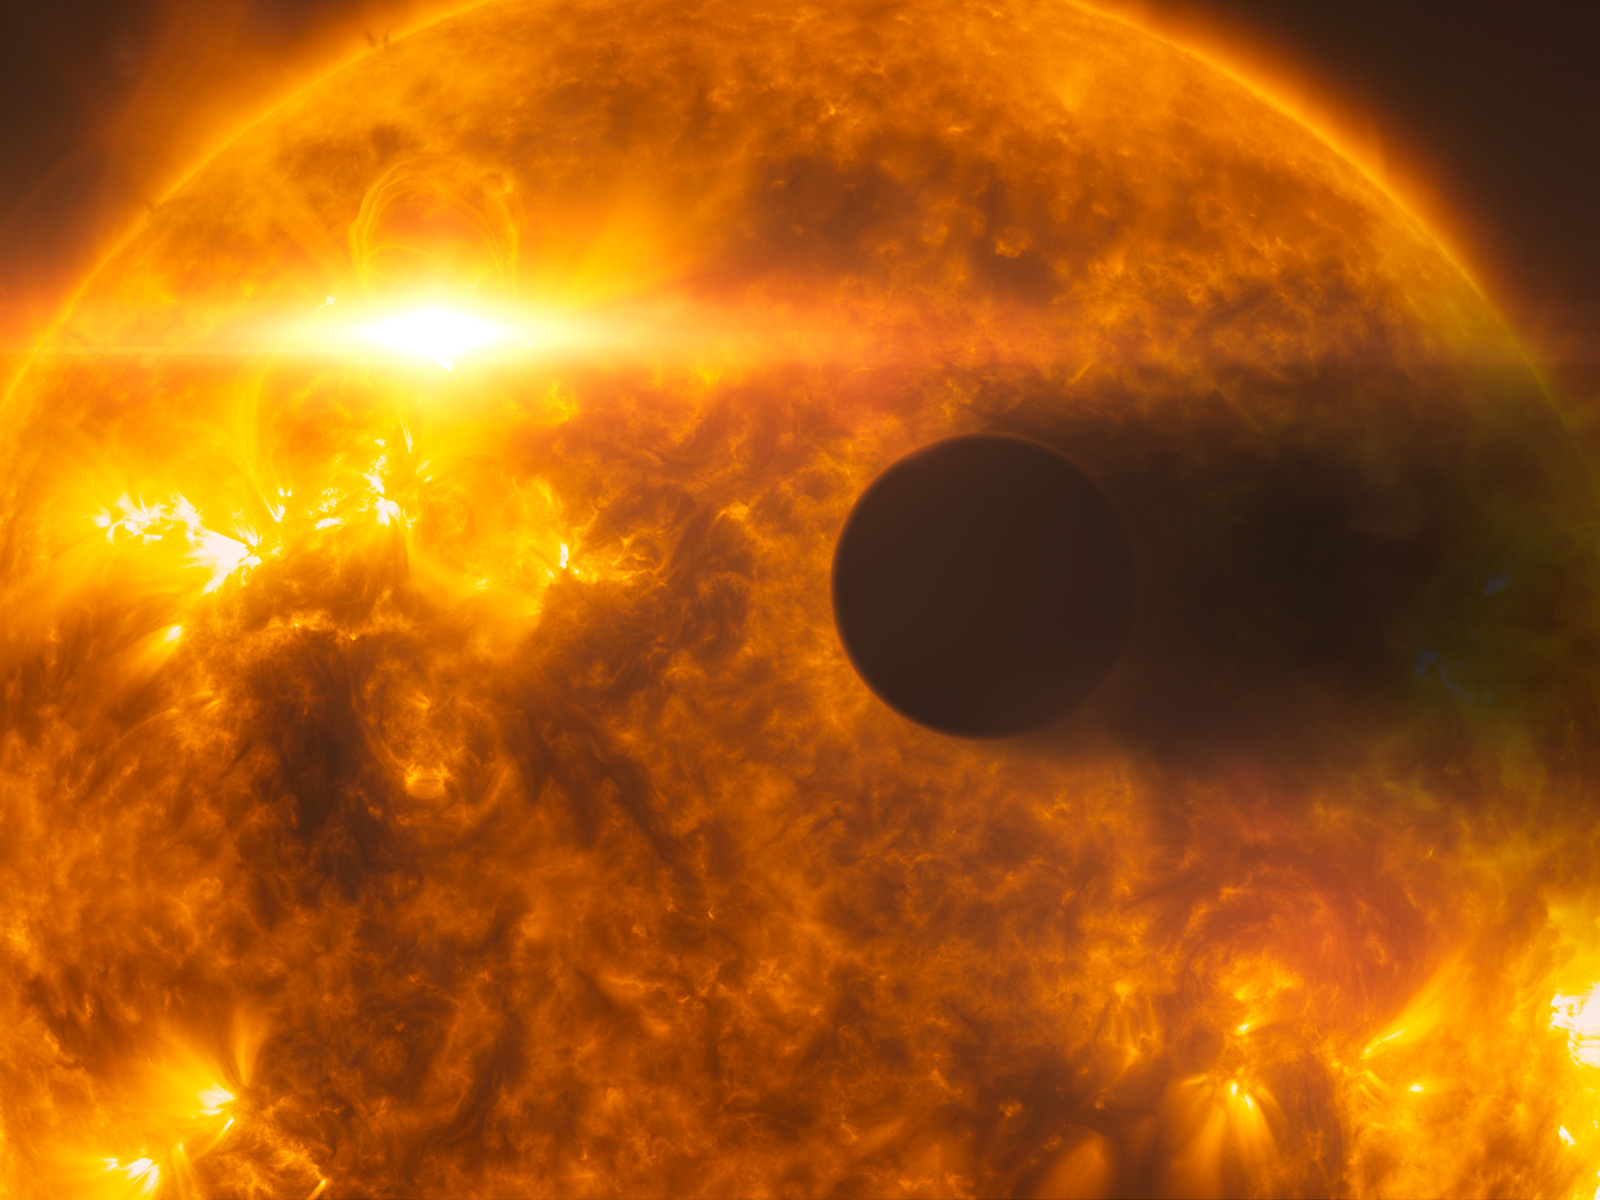 Stellar flare Hits Exoplanet HD 189733b (Artist's Impression)